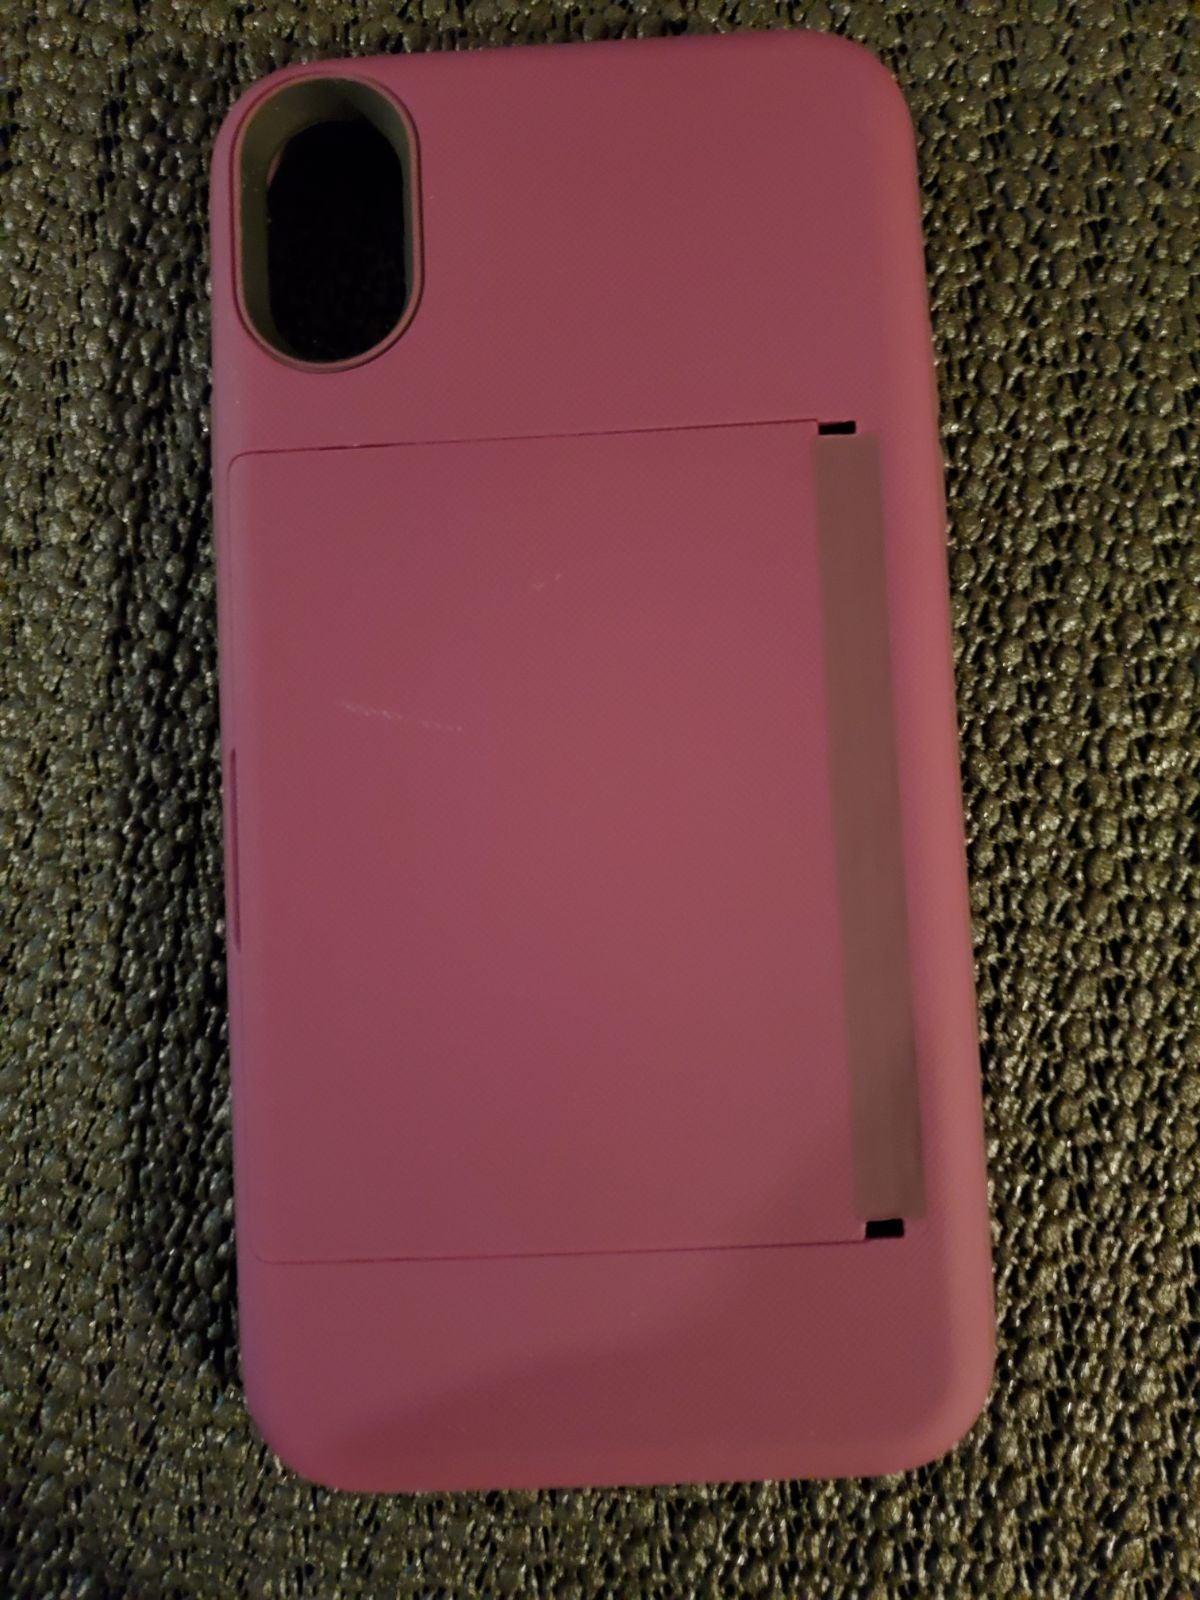 Incipio Cell Phone Case for iPhone X - P